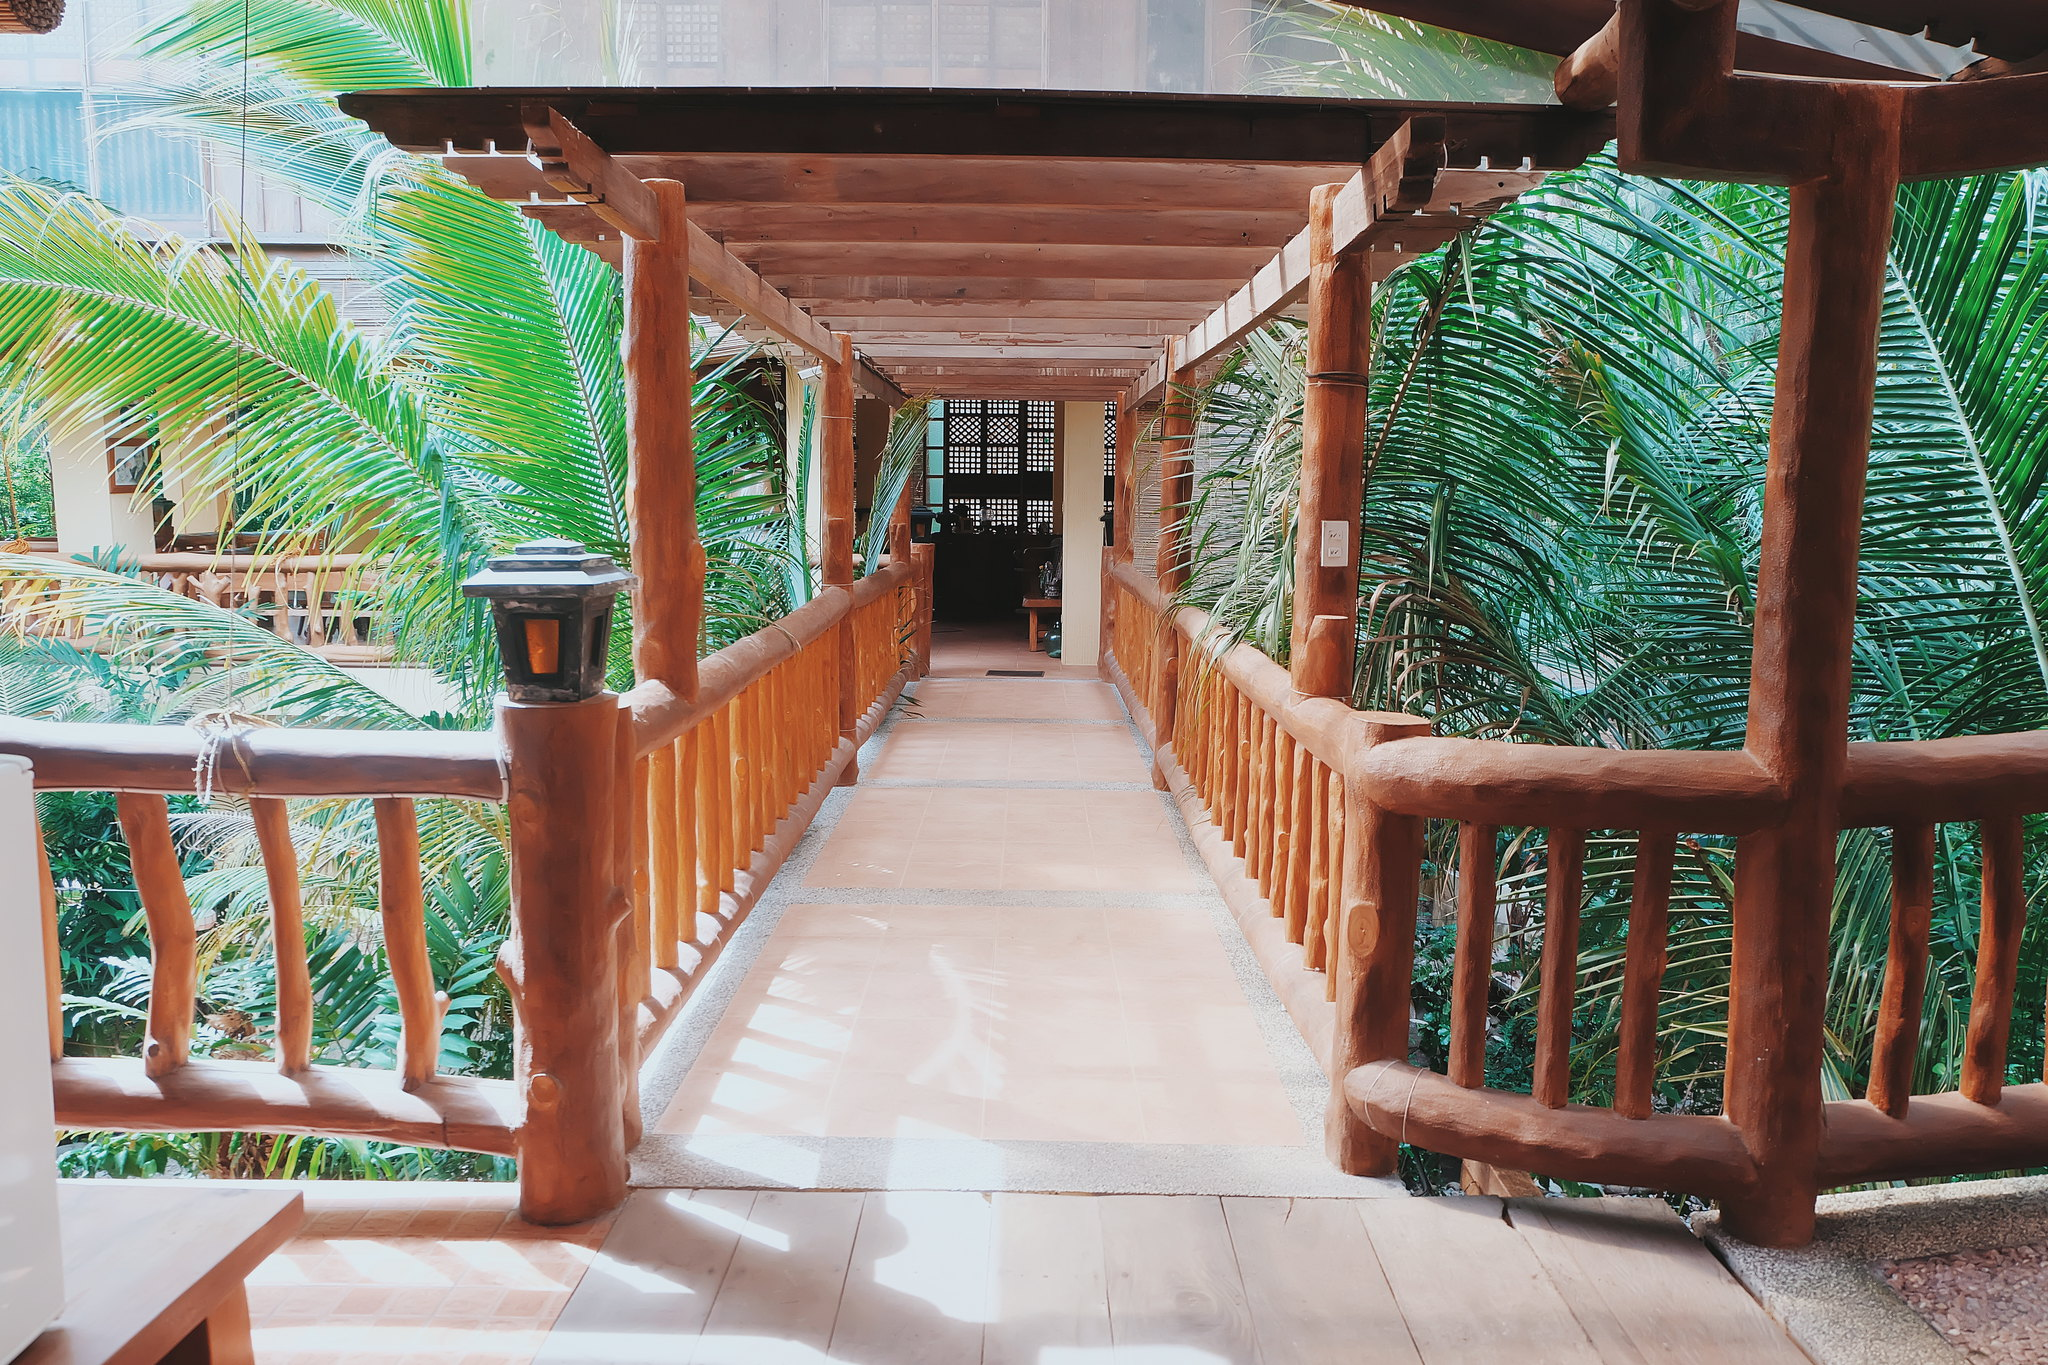 Staycation at Macampao Beach Resort in Cabangan, Zambales